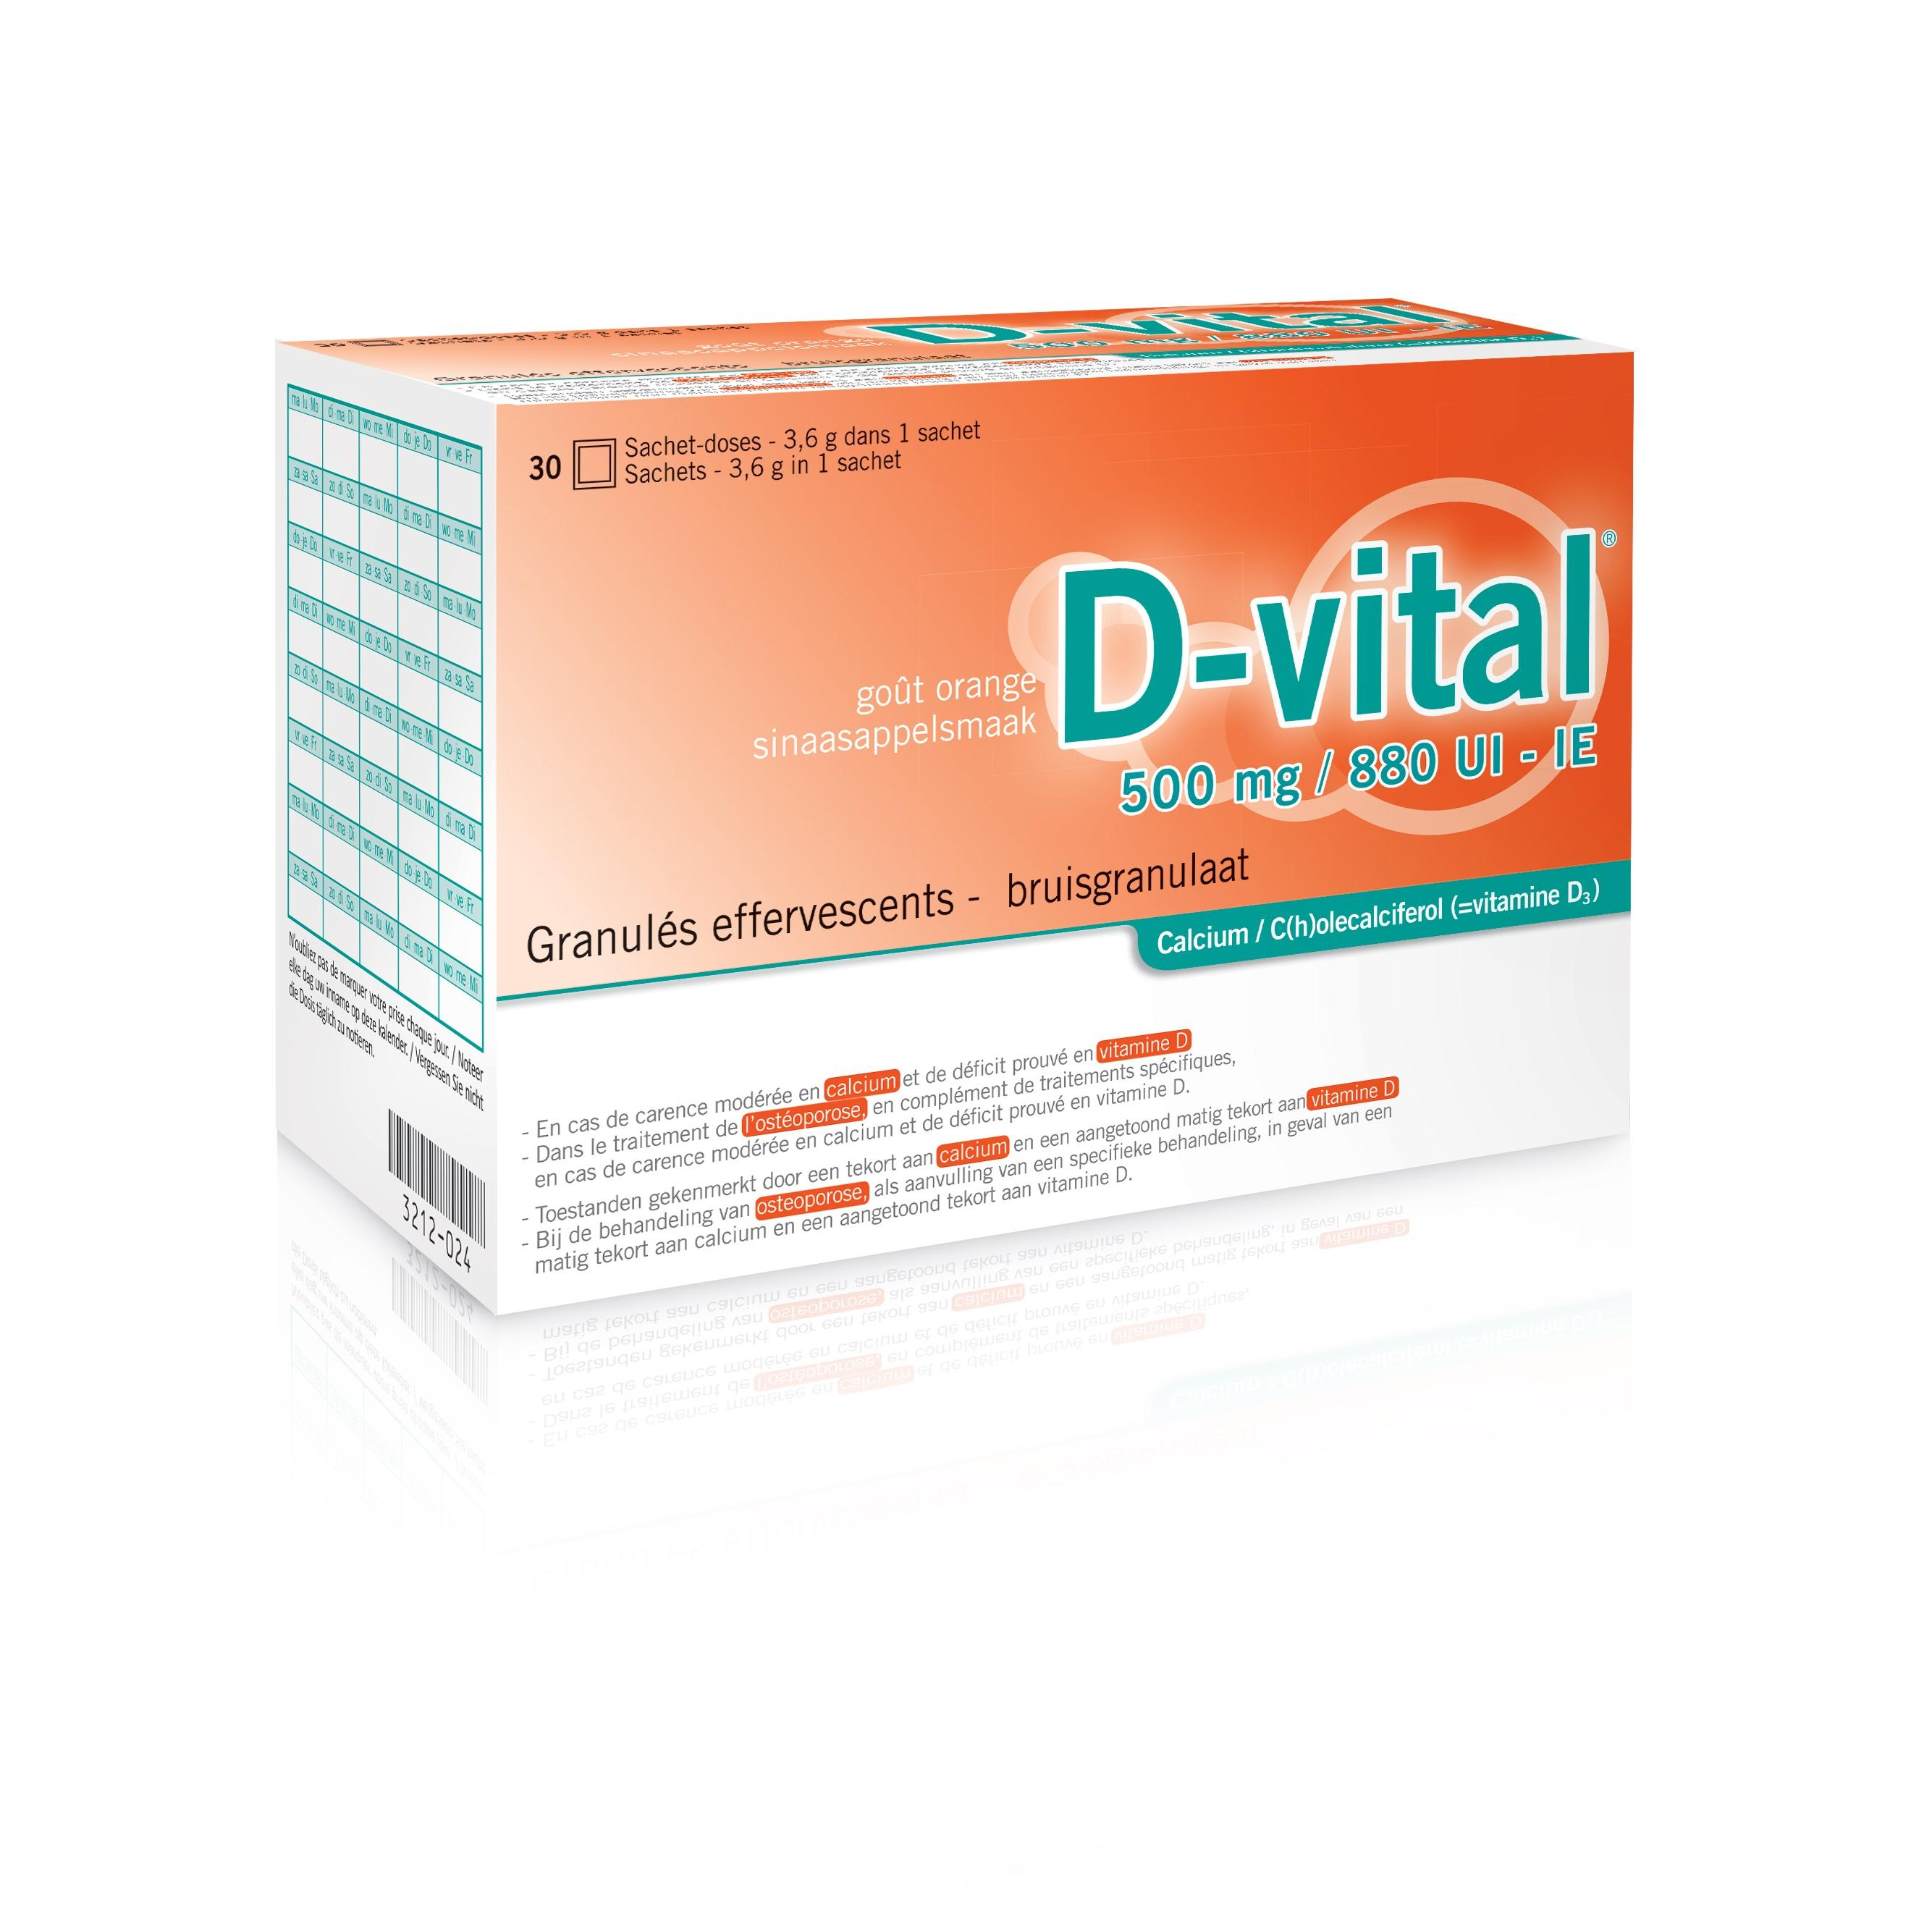 D-Vital sinaas 500/880 calcium